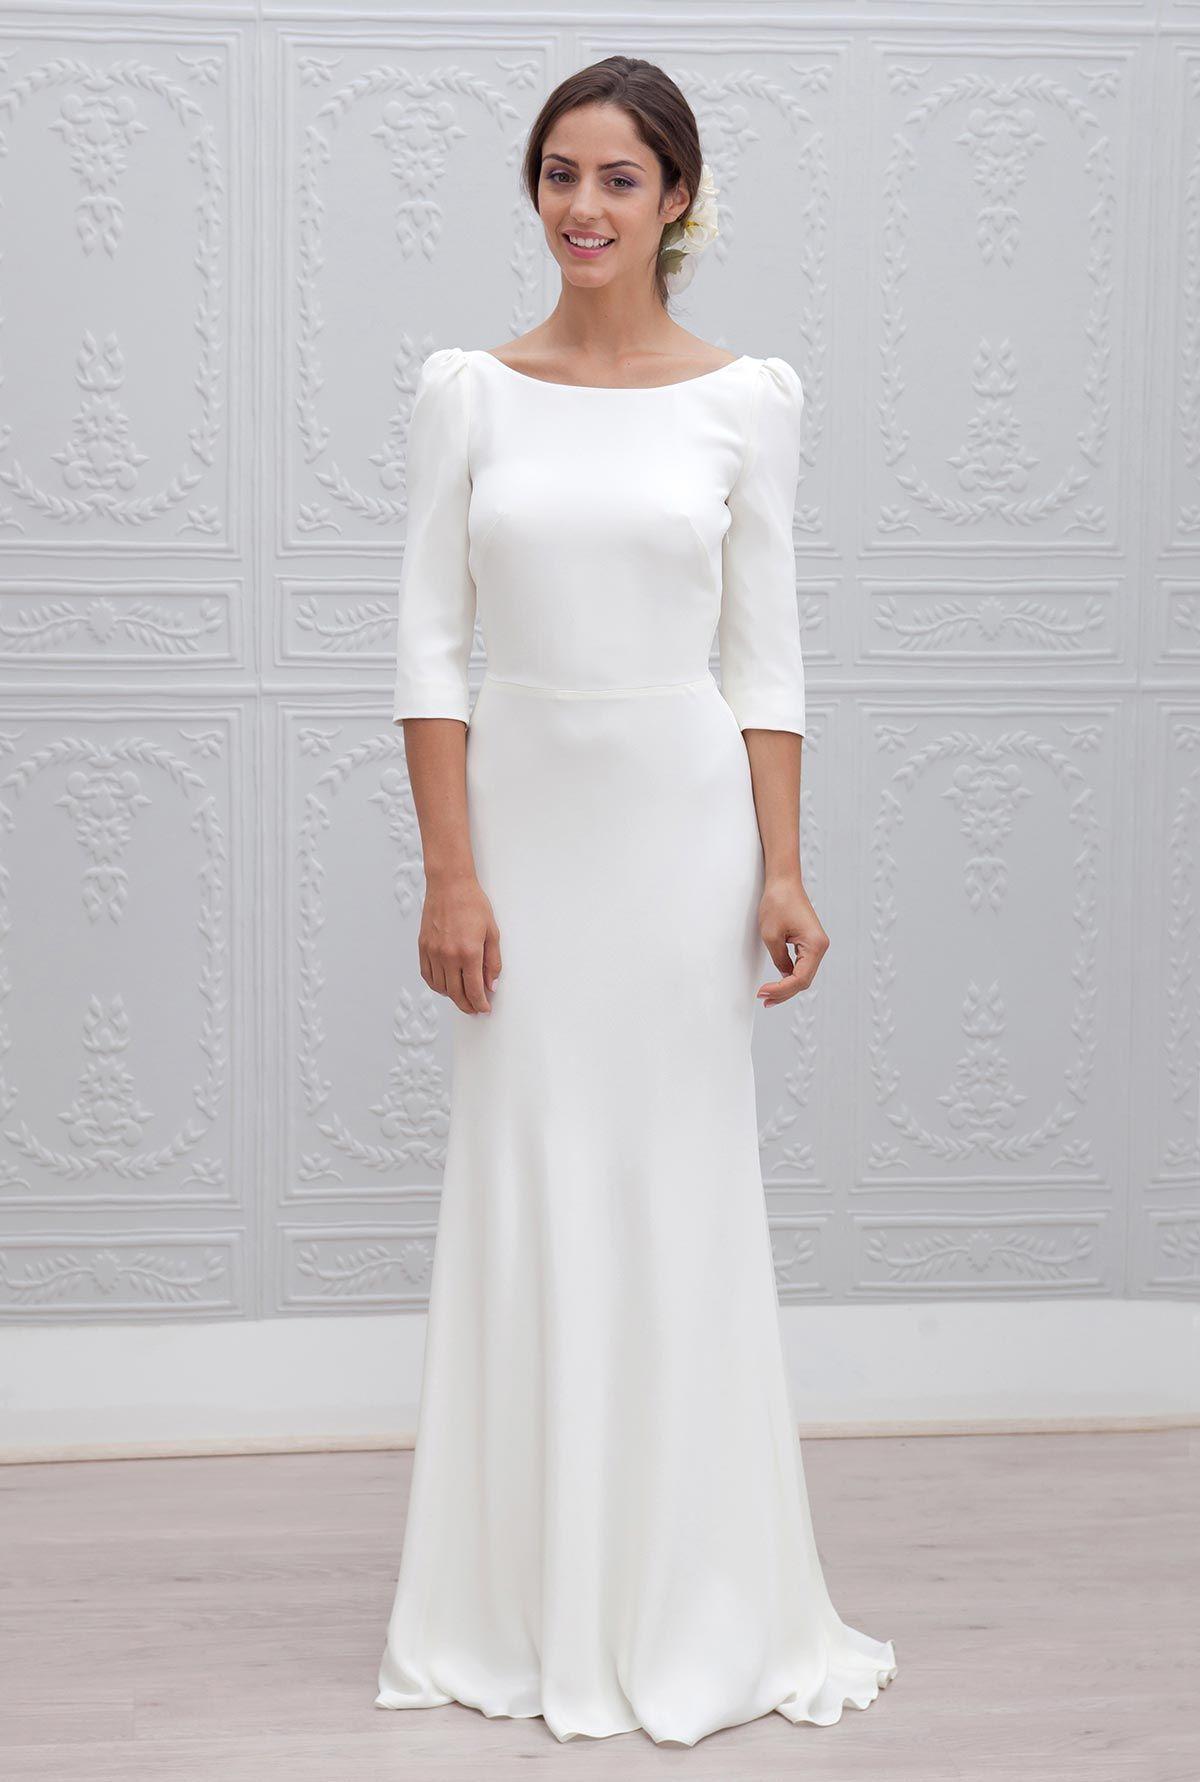 Les intemporelles mariage wedding dress and wedding